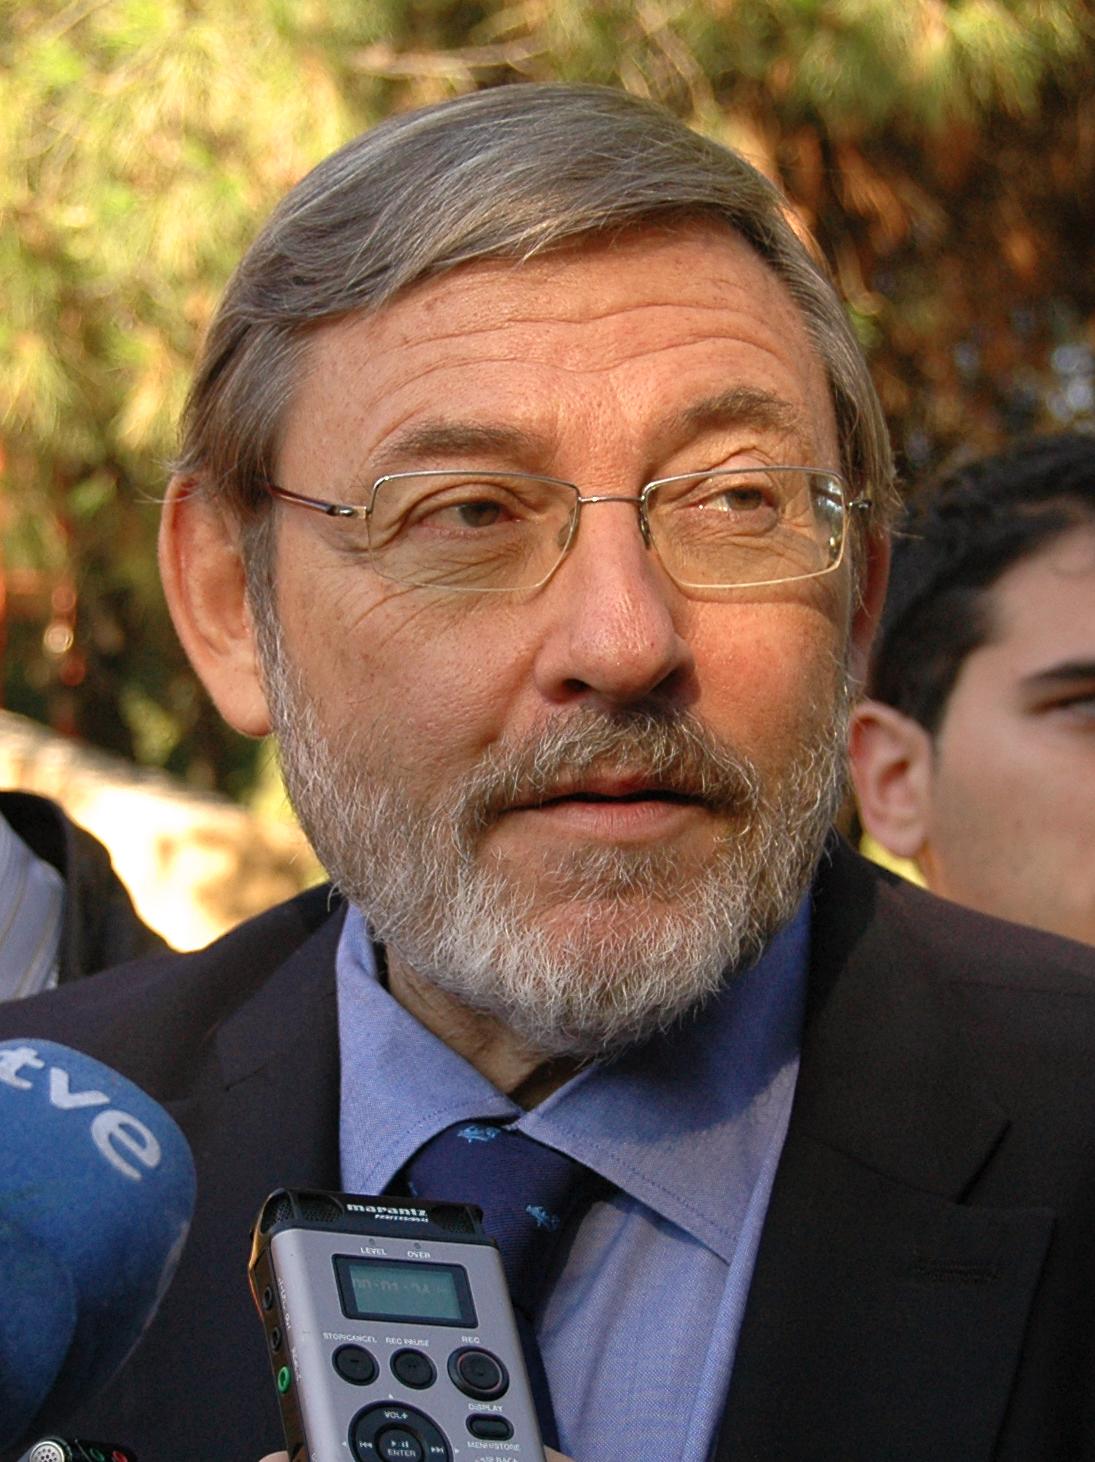 Jaime lissavetzky wikipedia la enciclopedia libre - Antonio carmona wikipedia ...